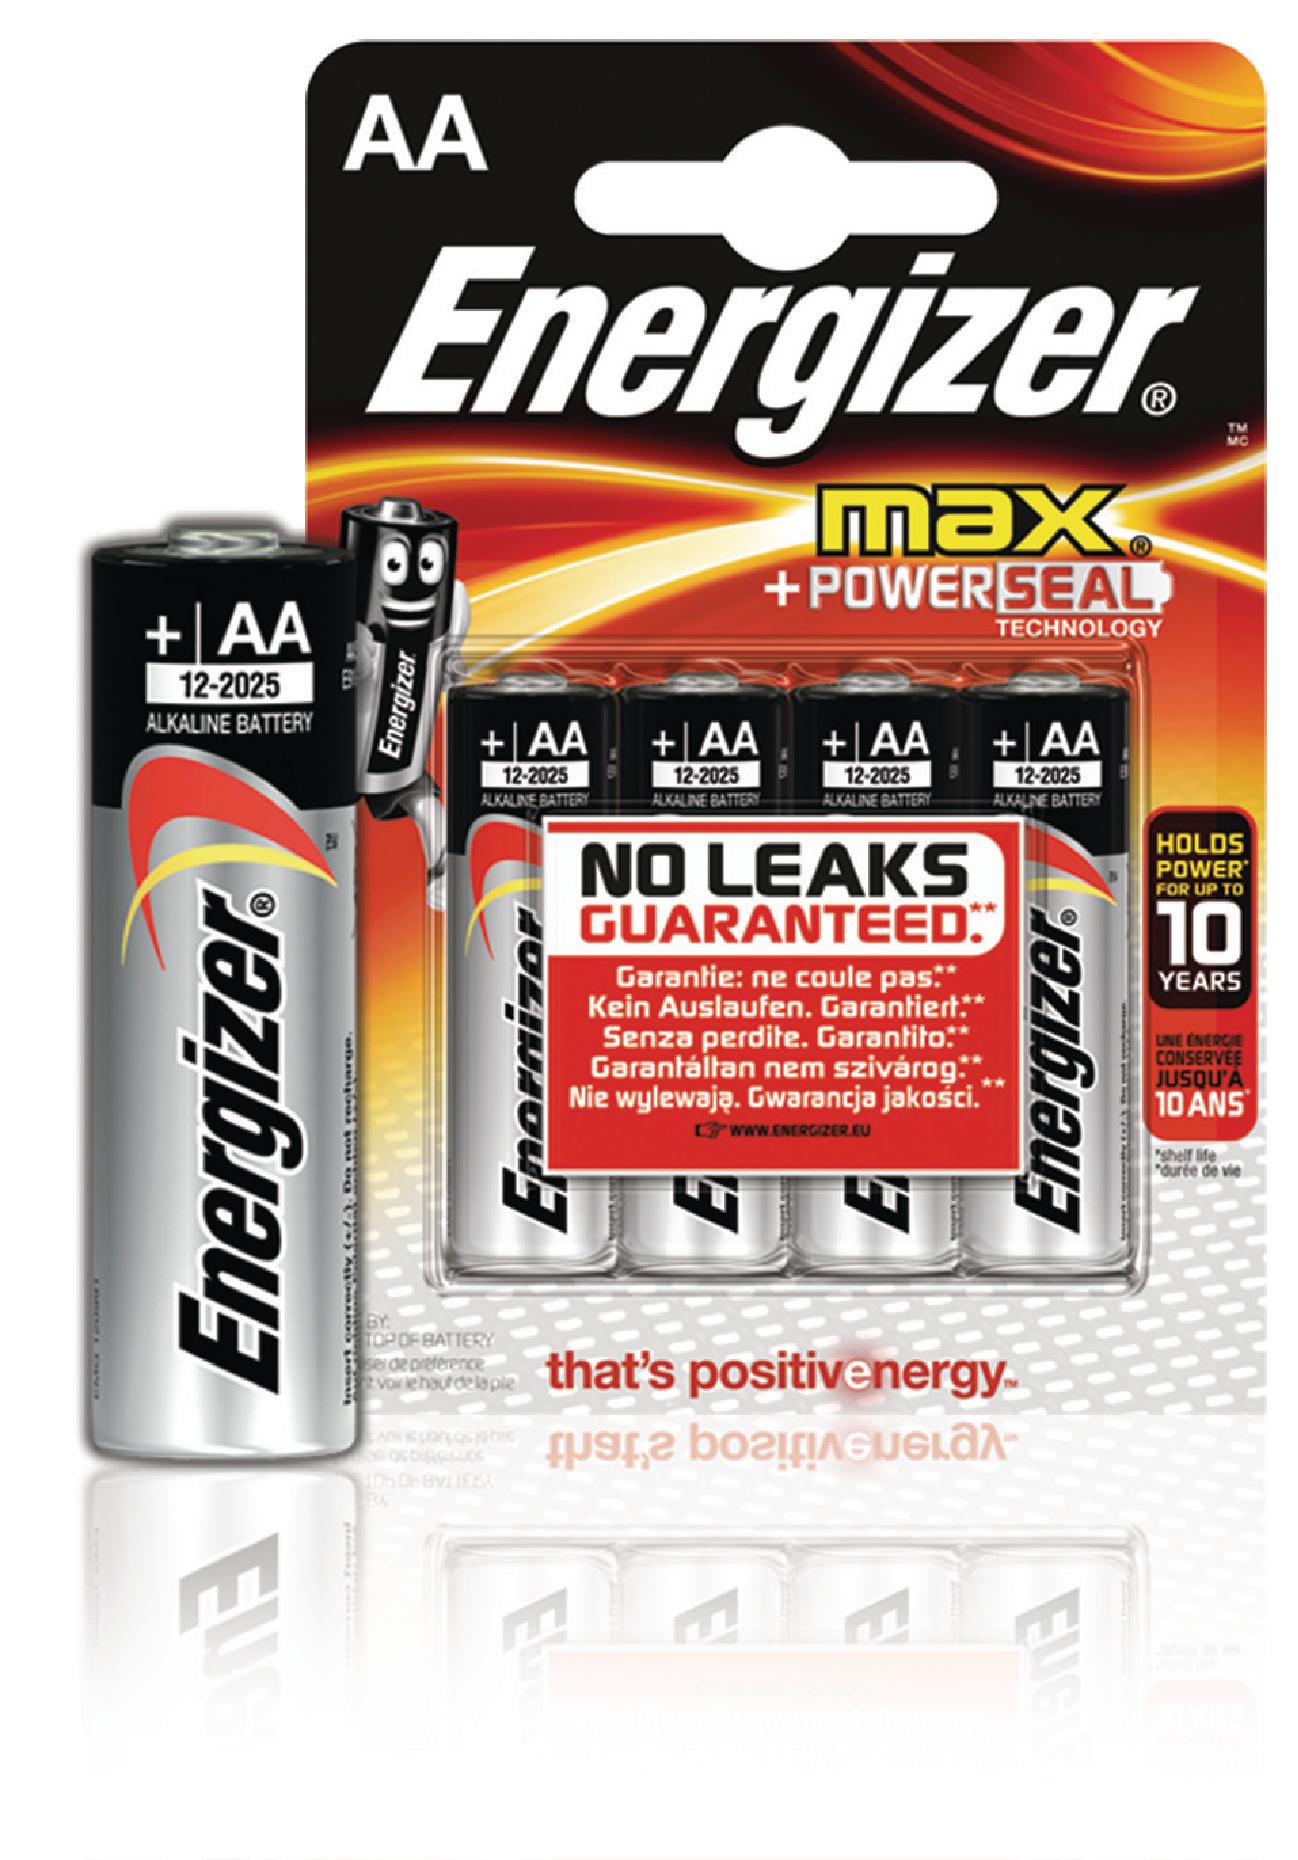 Alkalická baterie Energizer Max AA 1.5V, 4ks, EN-E300112500